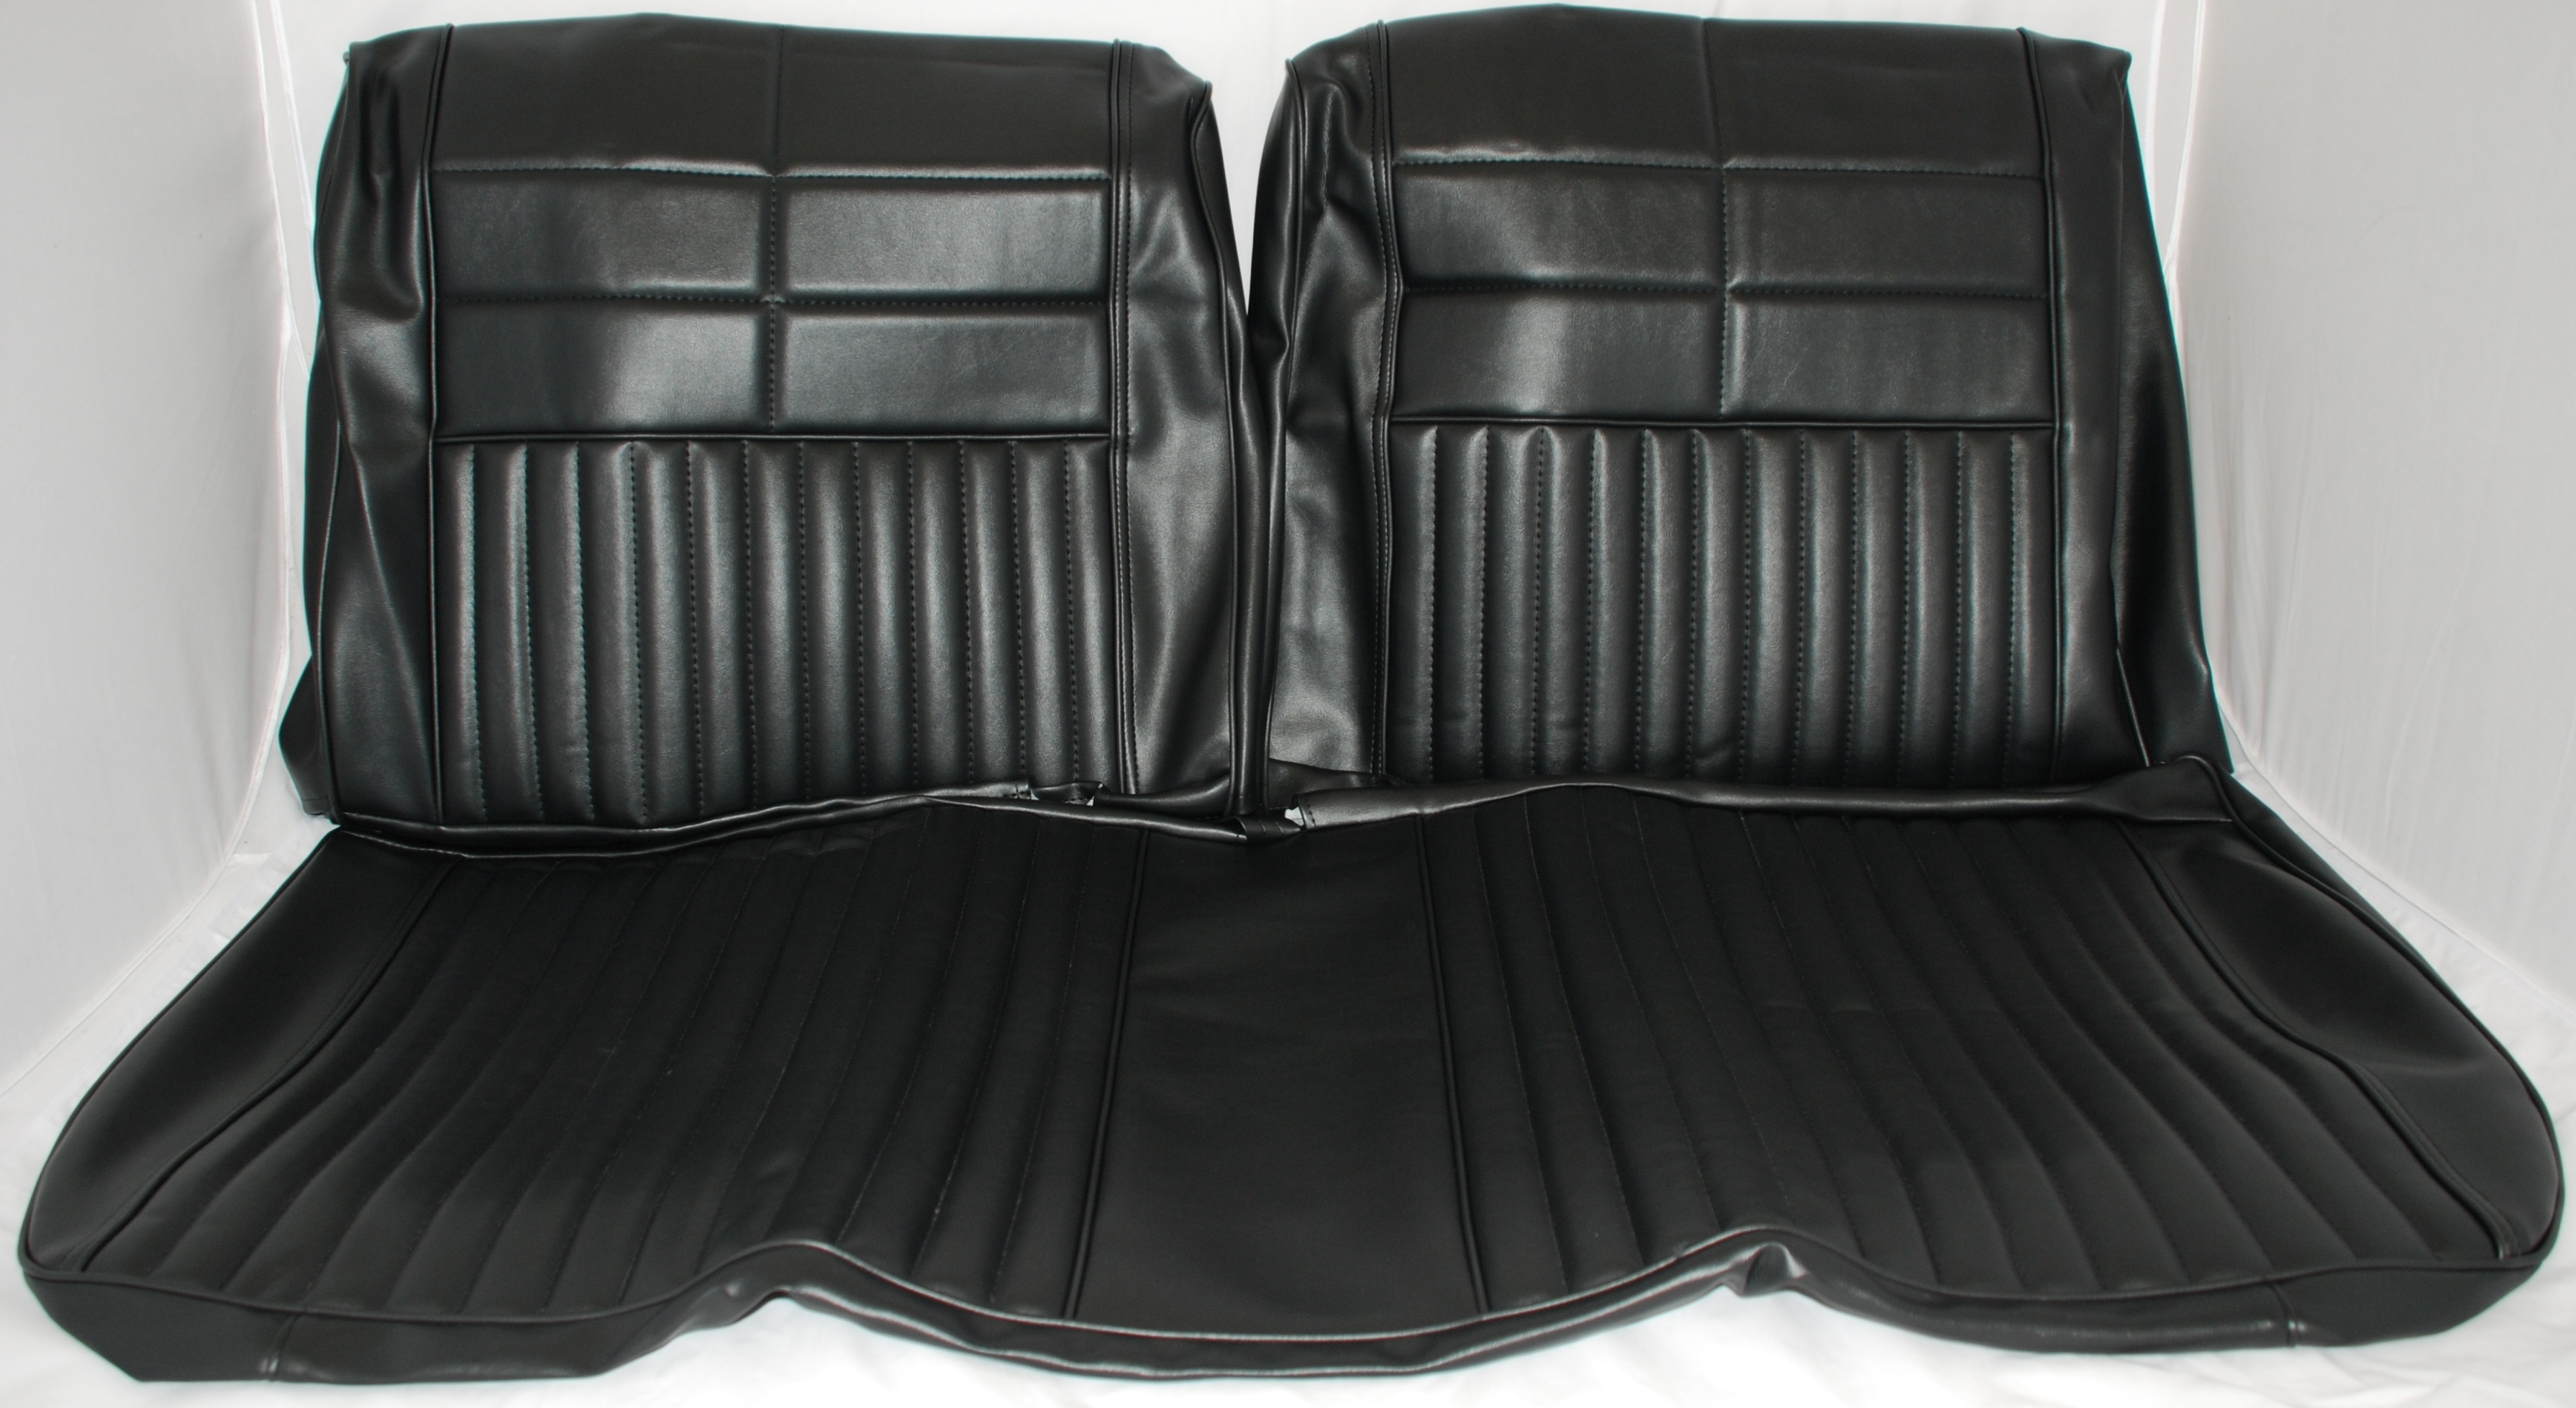 1965 Fairlane 500 Bench Seat Upholstery